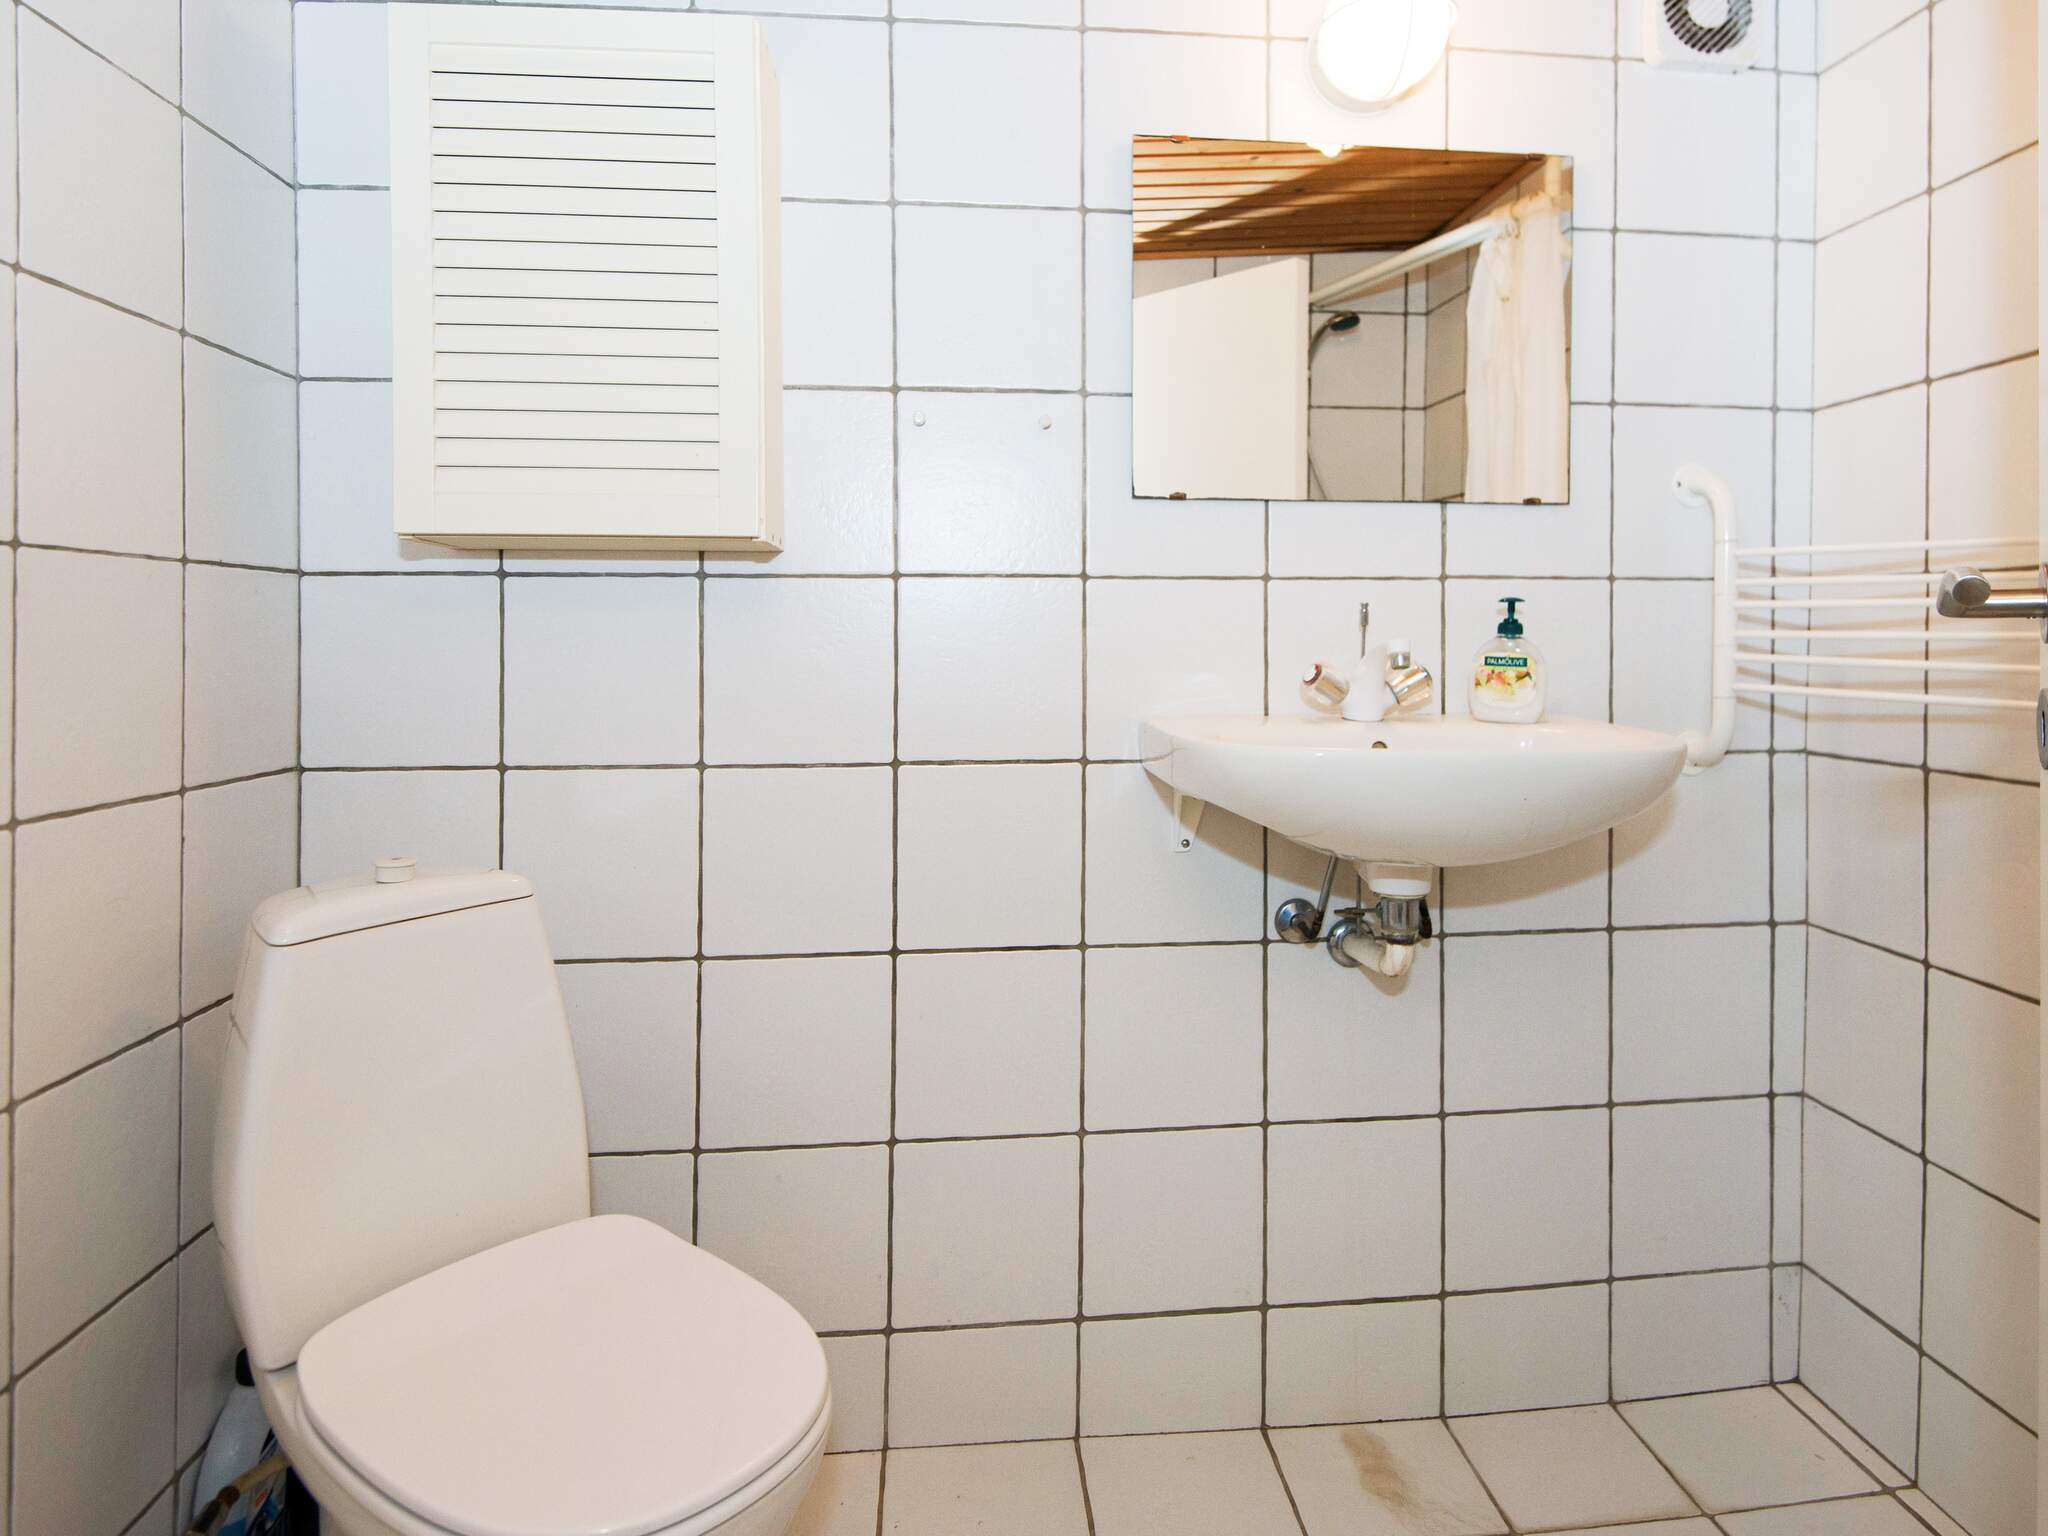 Ferienhaus Handrup Bakker (81802), Handrup, , Ostjütland, Dänemark, Bild 11